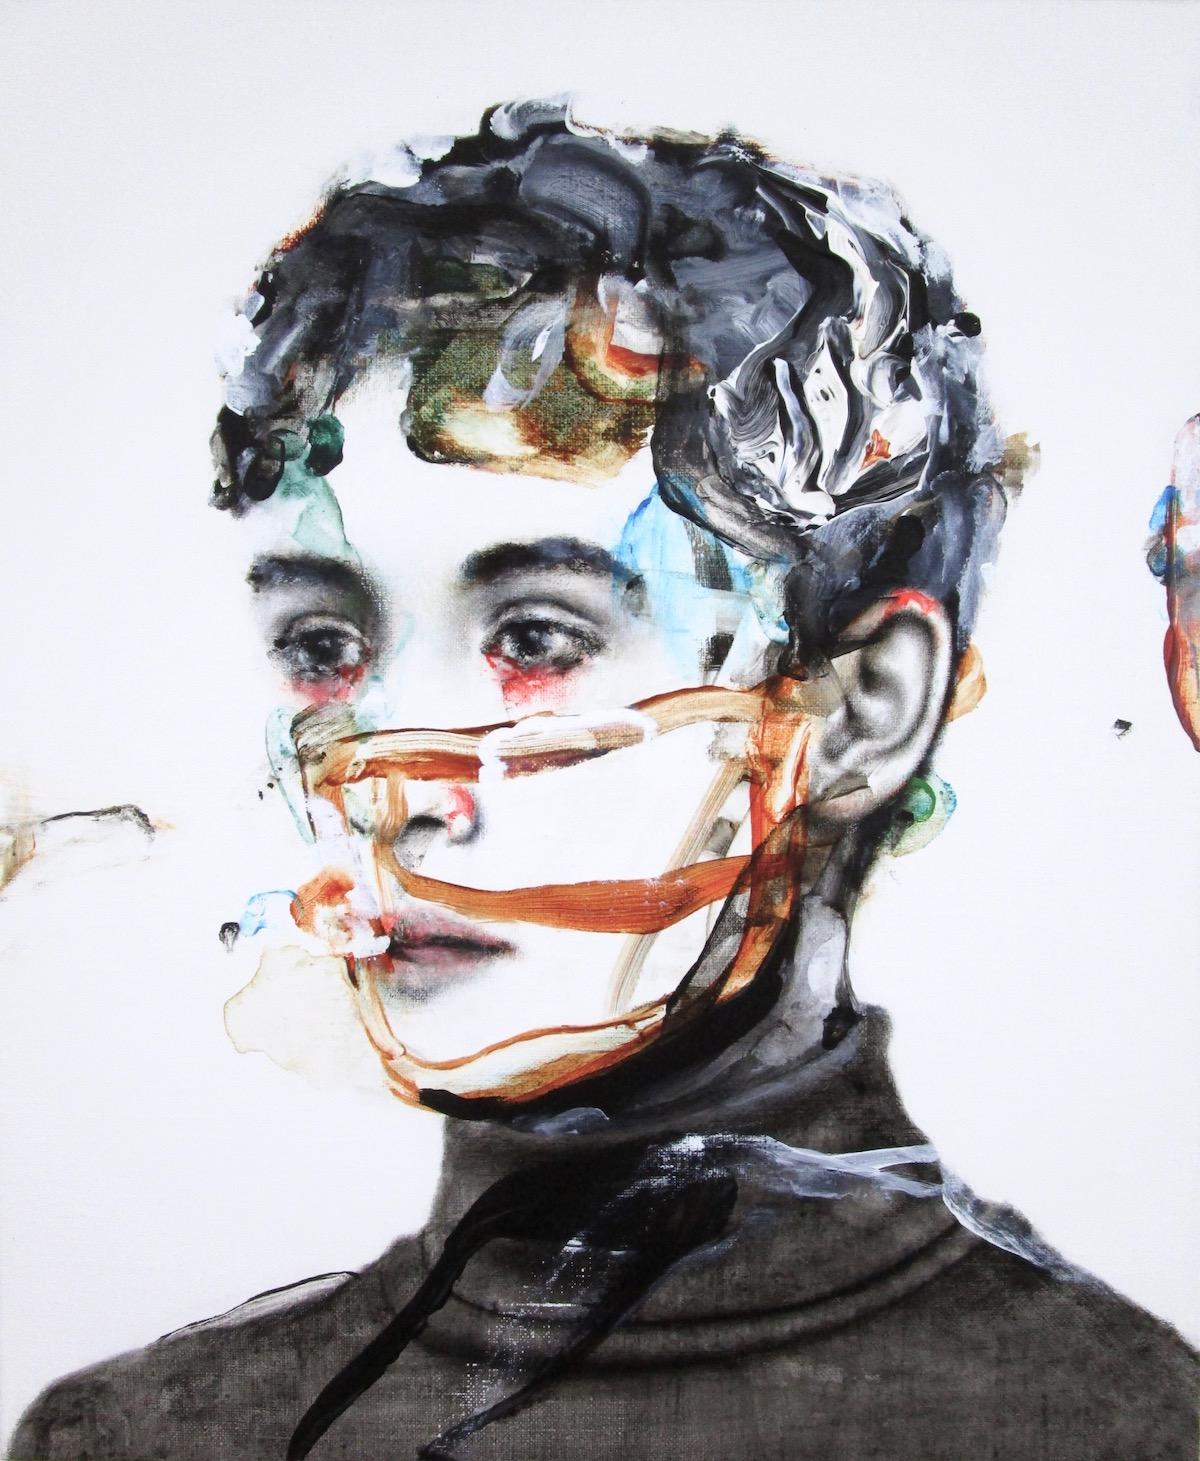 antoine cordet canvas toile peinture painting portrait art artist artiste peintre acrylic oil a new kind of water